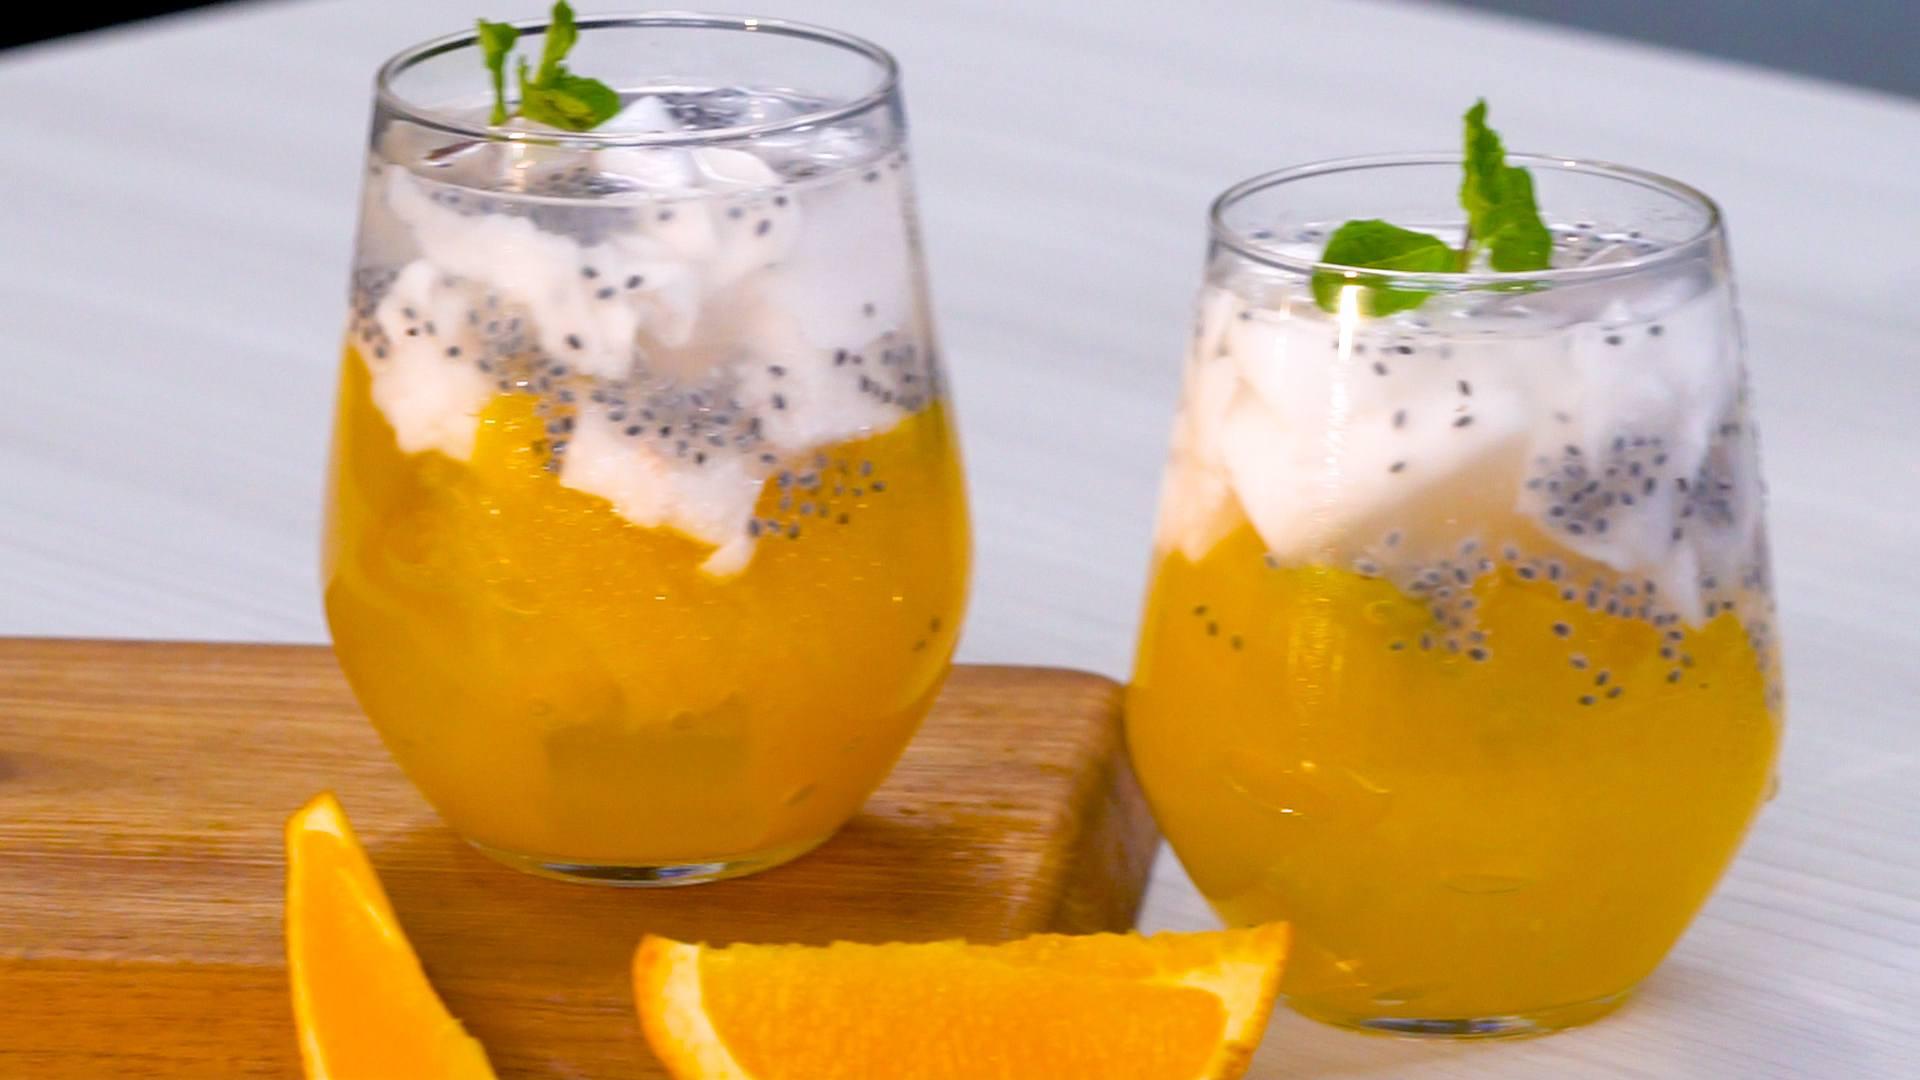 Resep Es Kelapa Muda Jelly Jeruk - Masak Apa Hari Ini?